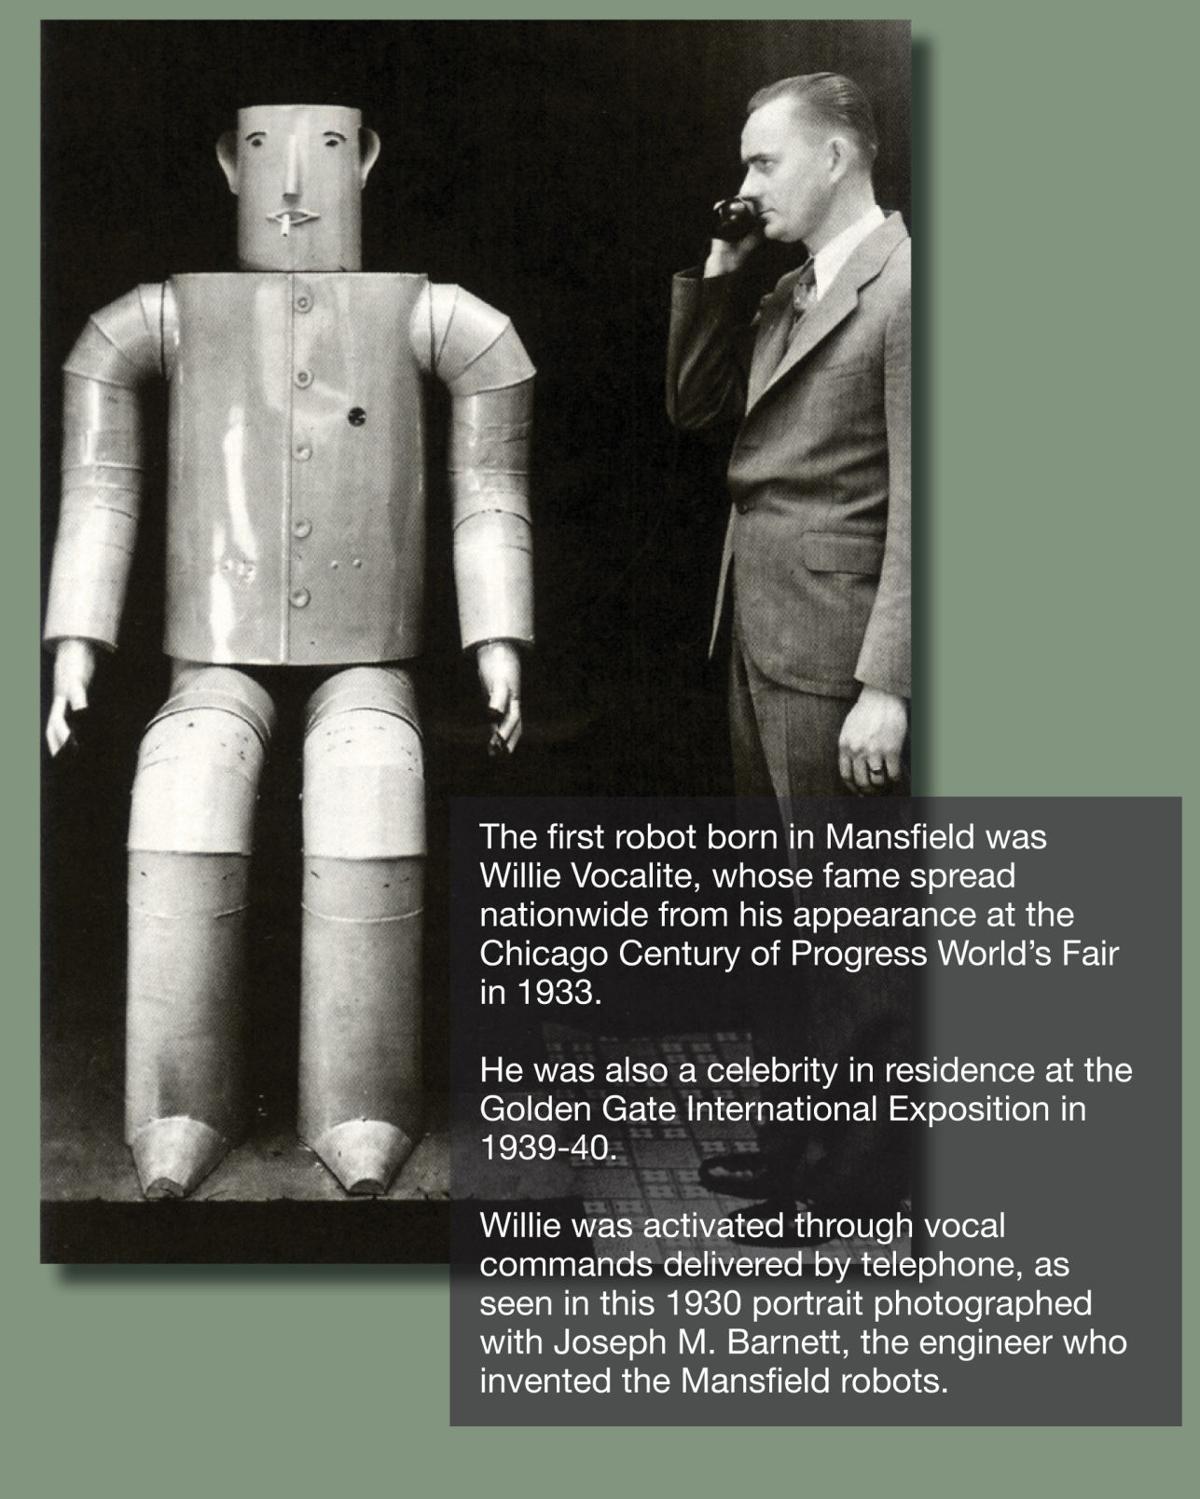 Willie Vocalite and his creator JM Barnett